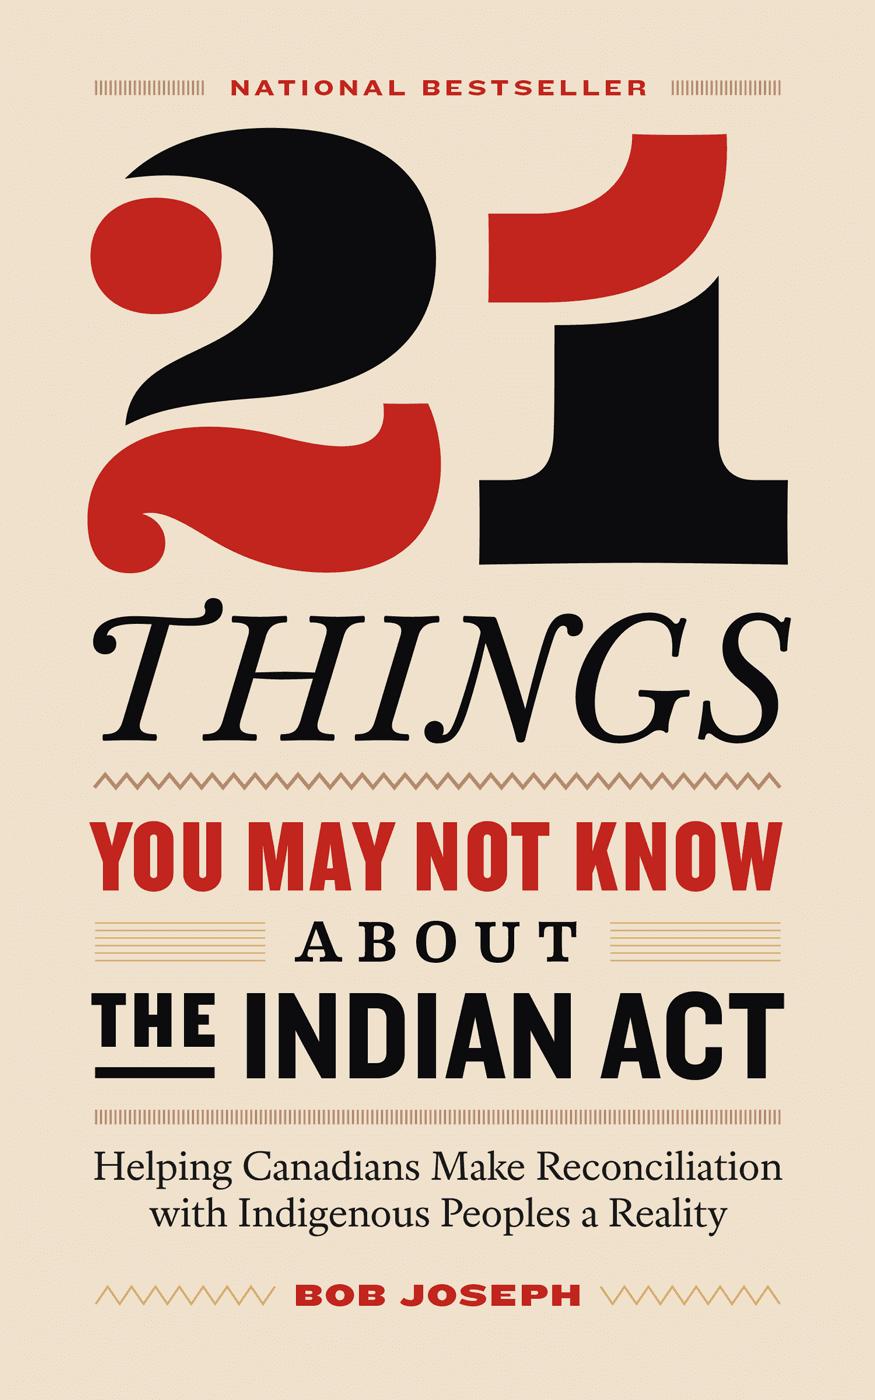 21Things_May8_1400-C National Bestseller.png